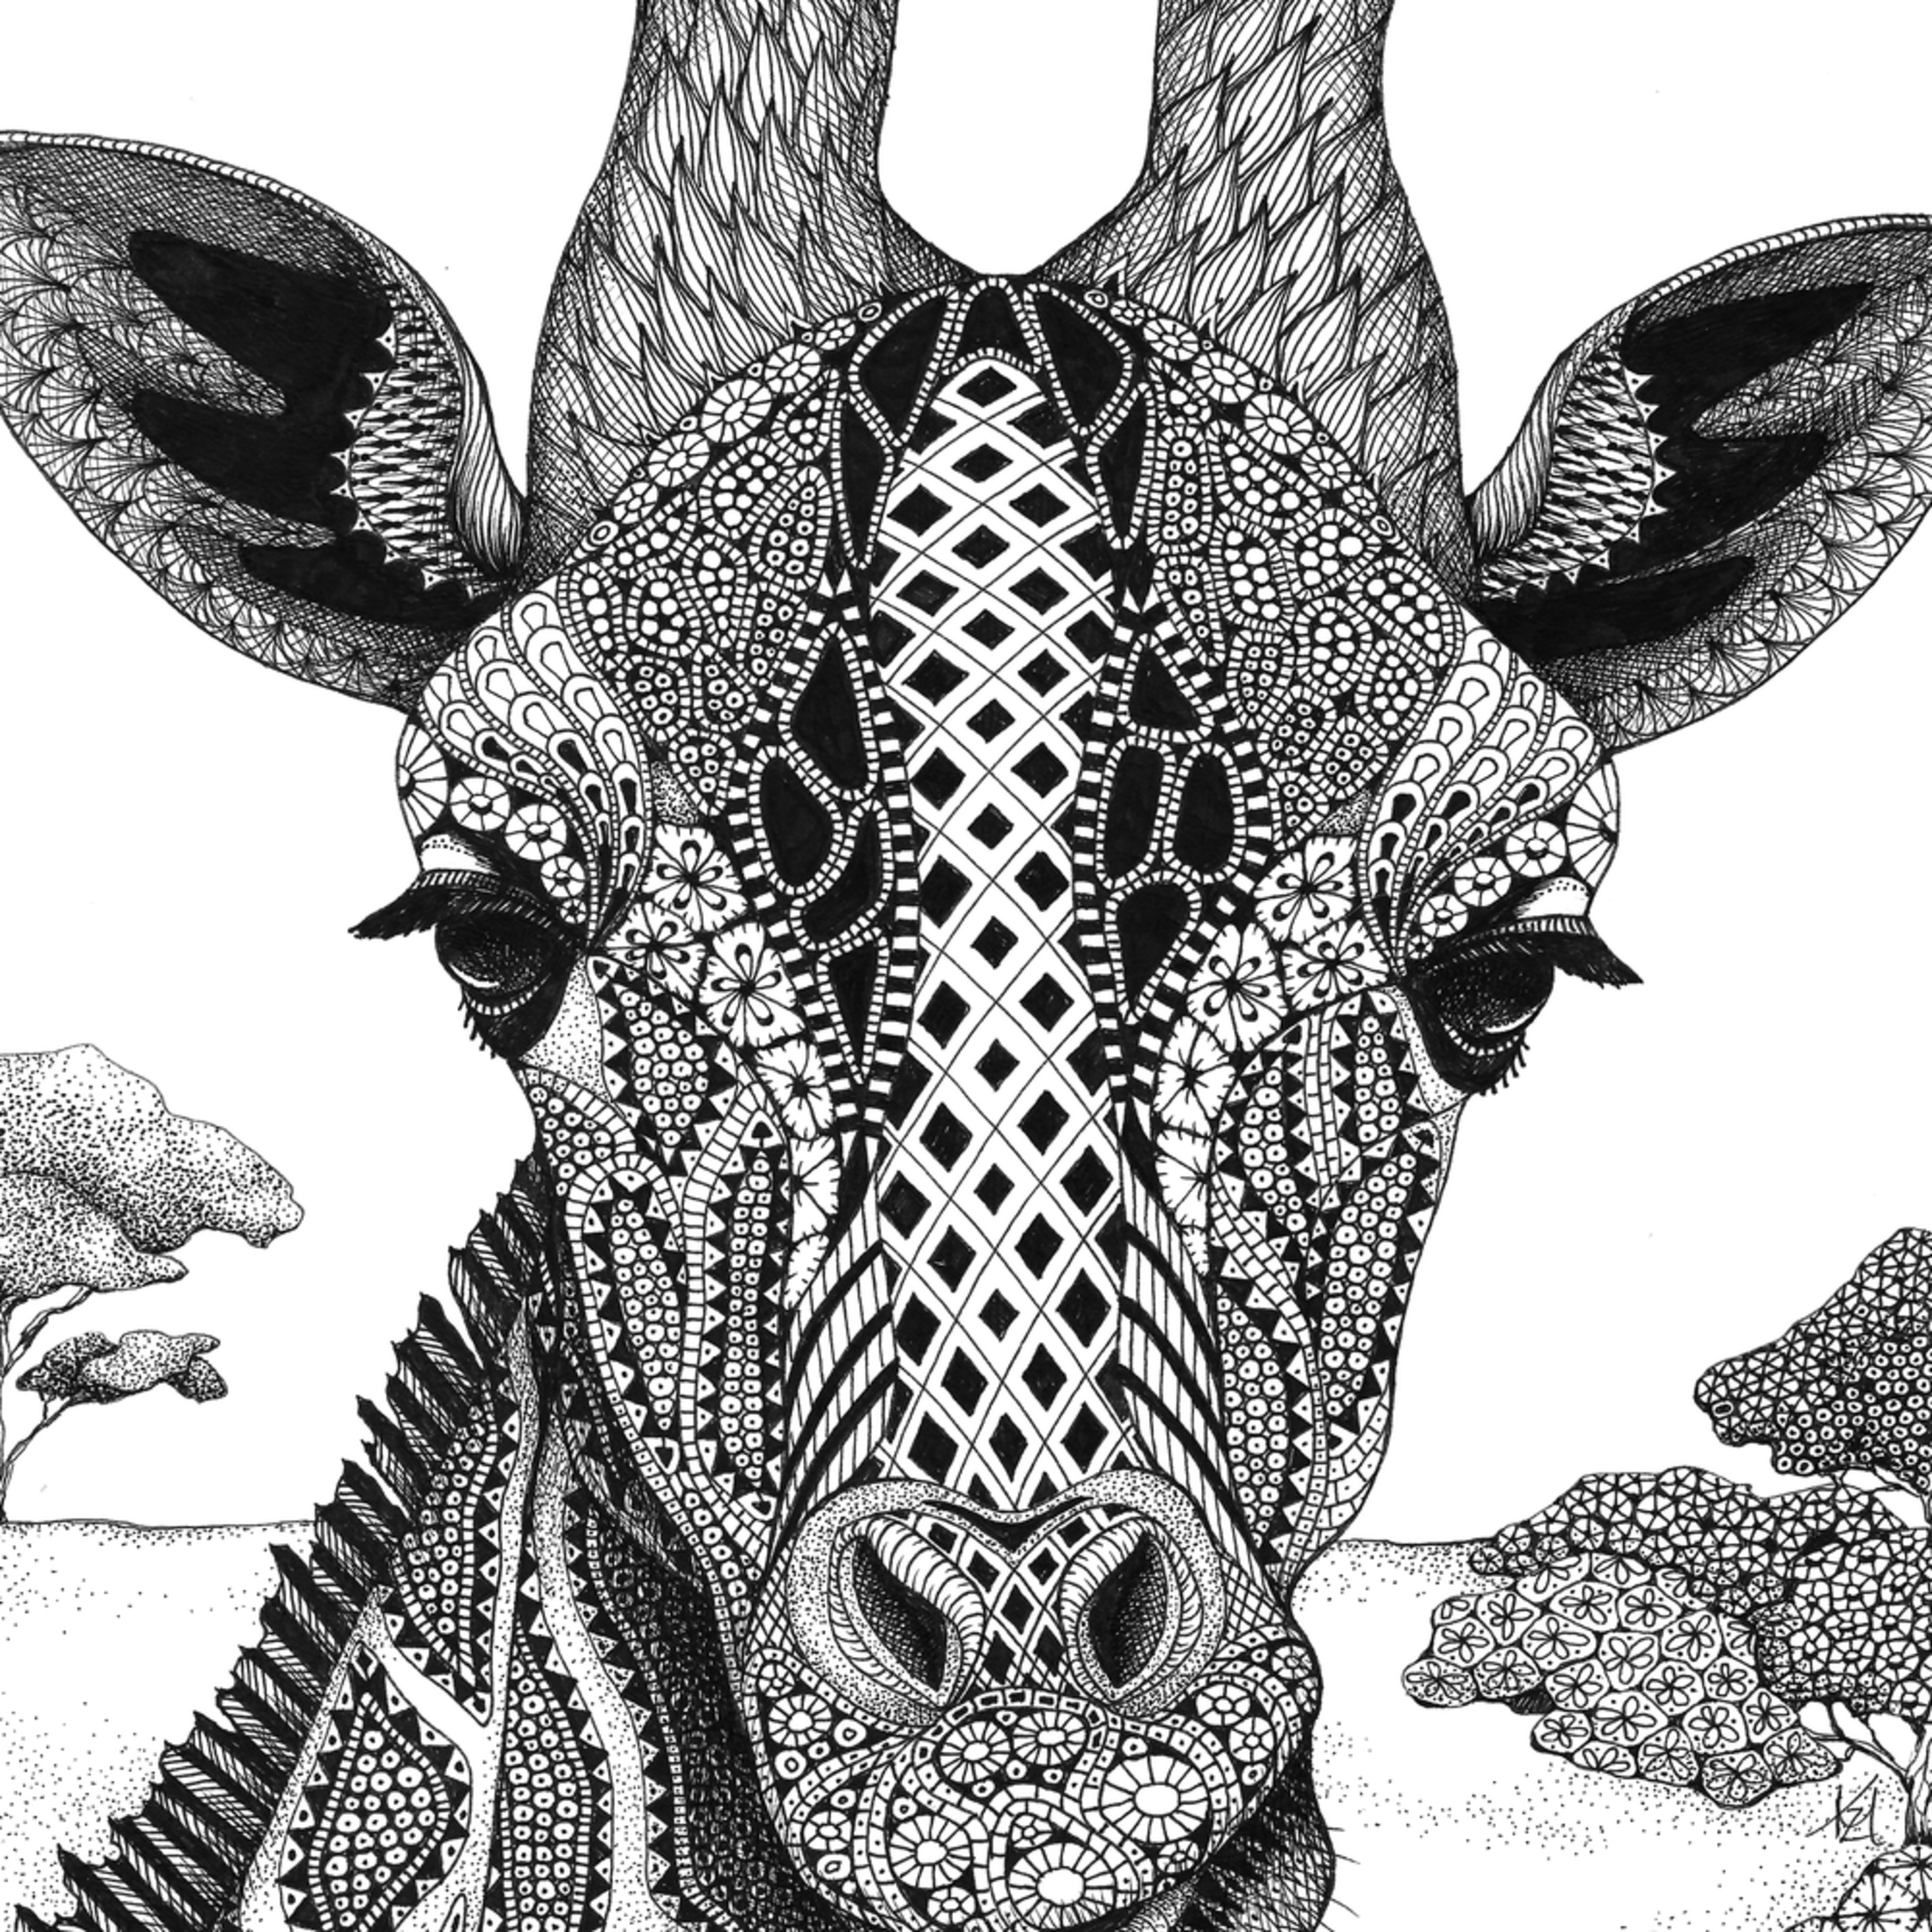 Giraff  serengeti plains giraffe portrait wfrhsl